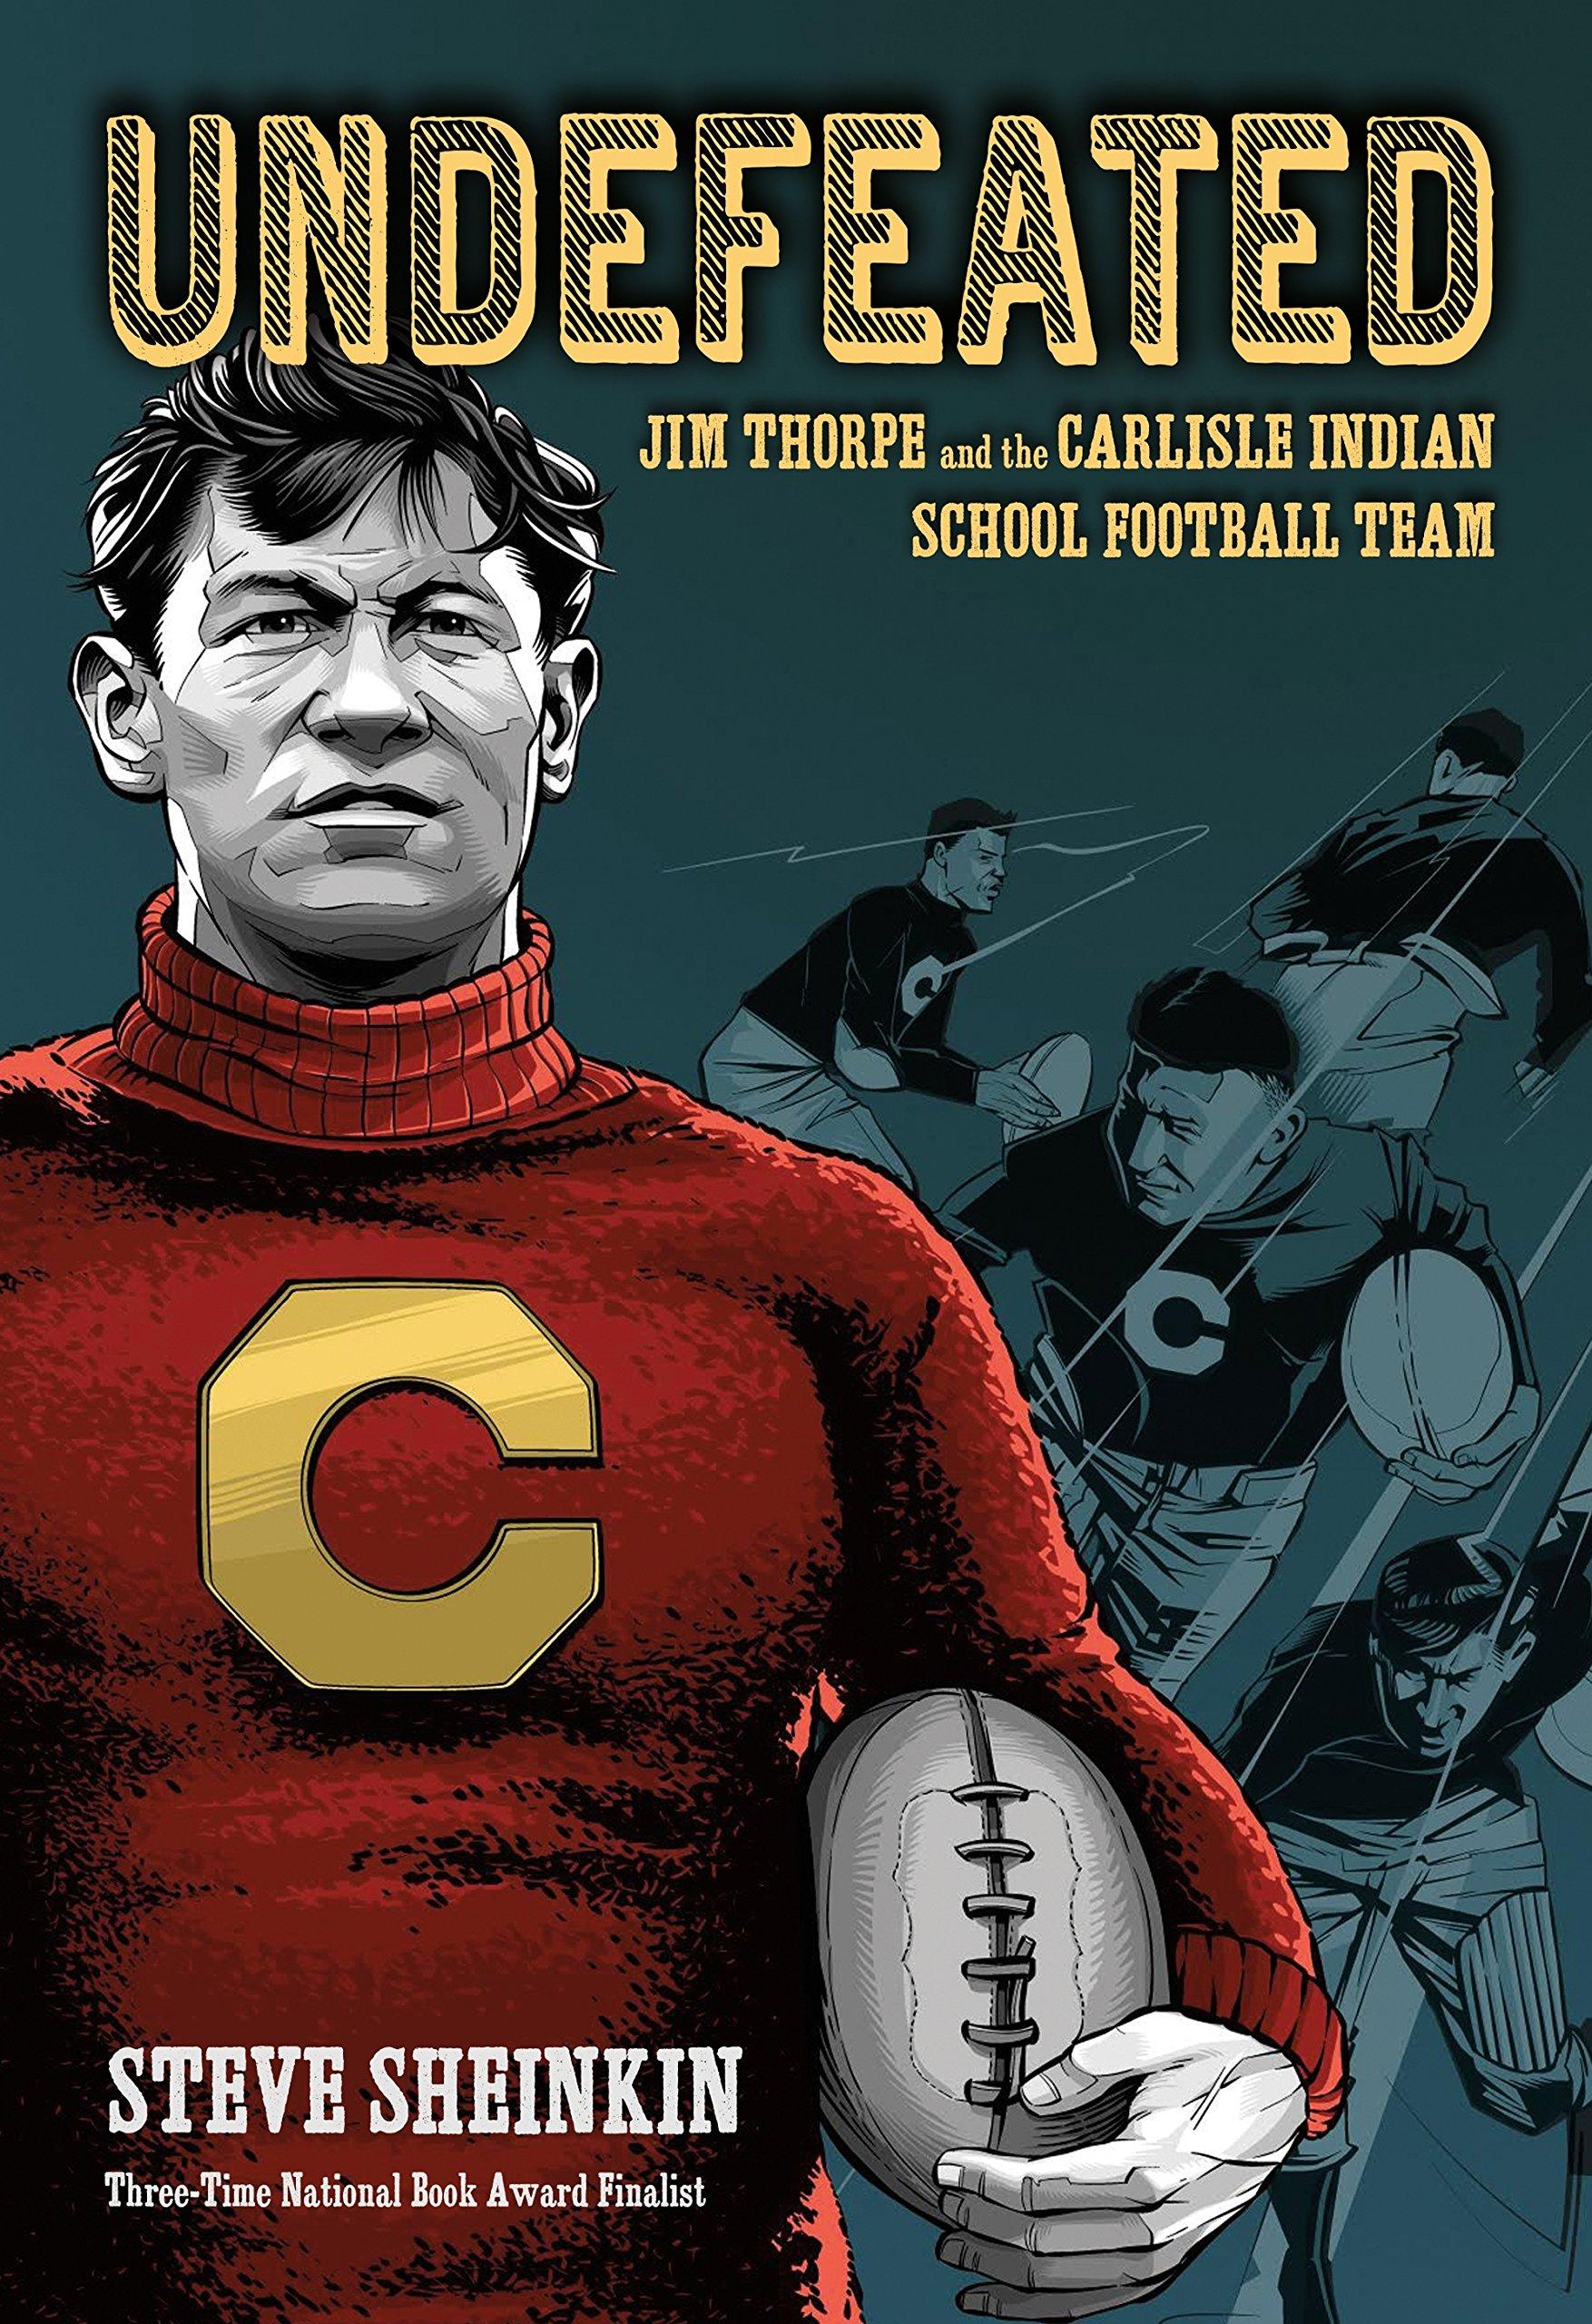 Amazon.com: Undefeated: Jim Thorpe and the Carlisle Indian School Football  Team (9781596439542): Steve Sheinkin: Books